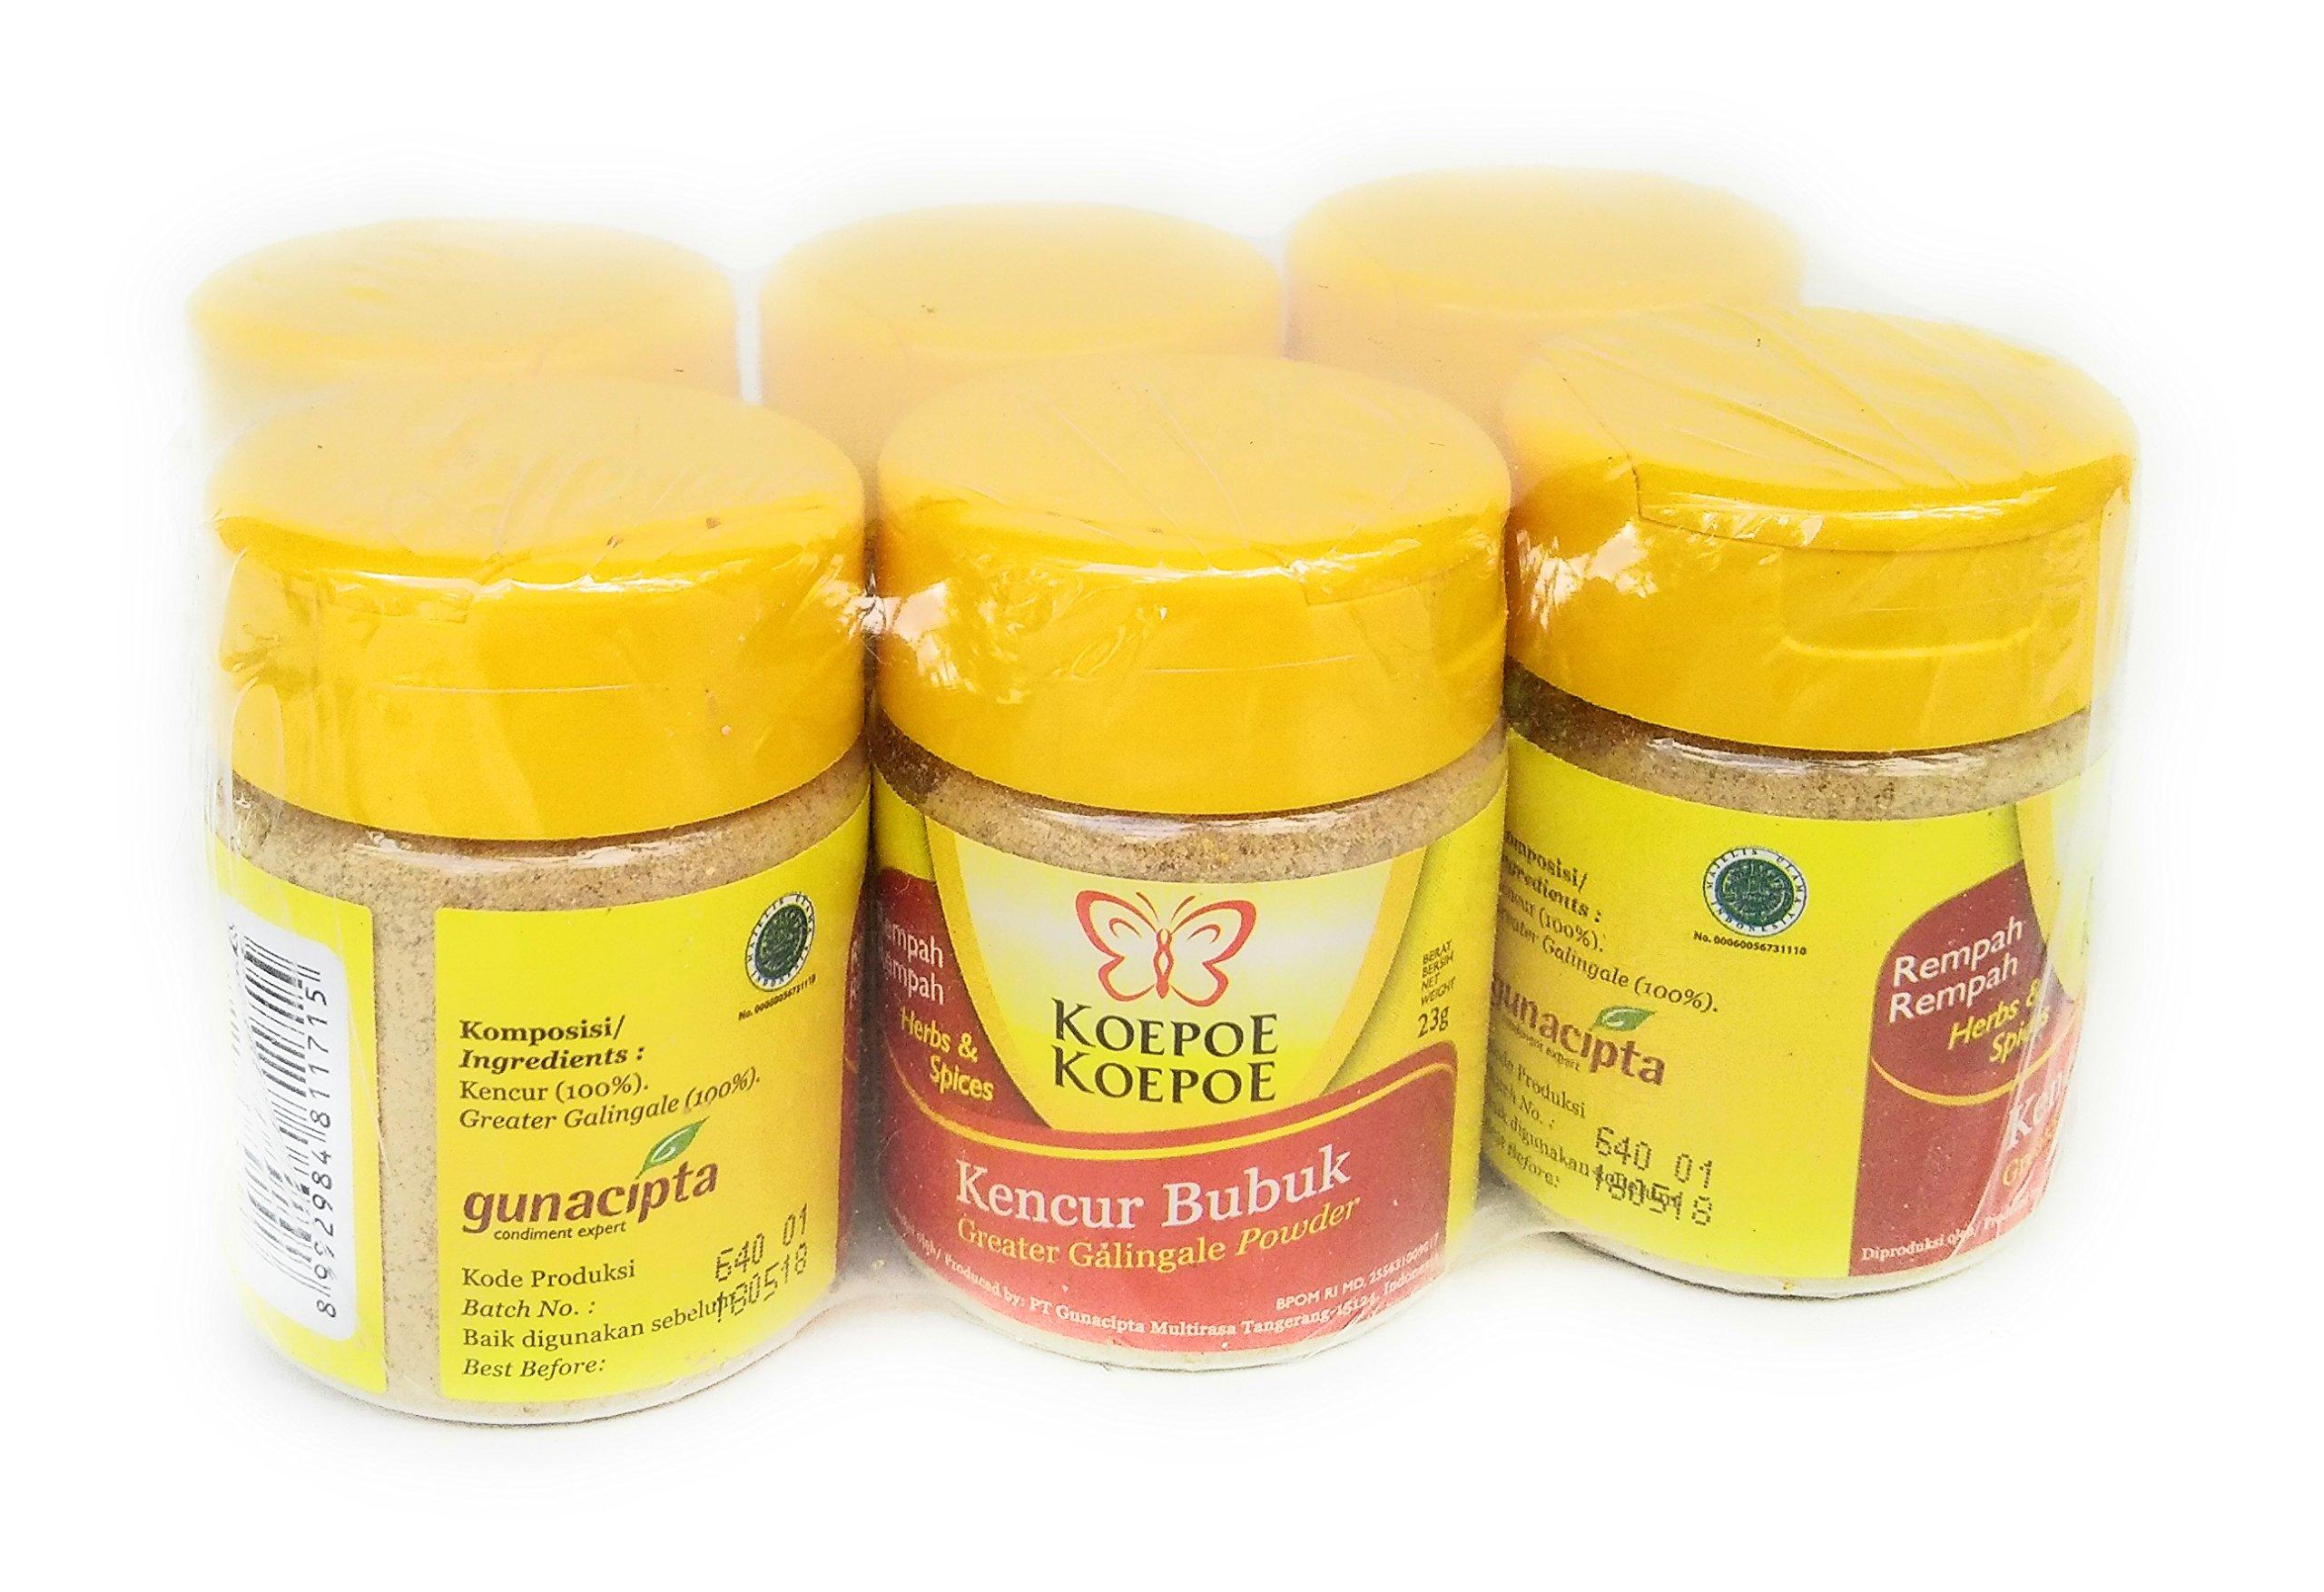 Koepoe-koepoe Kencur Bubuk - Greater Galingale Powder, 23 Gram (Pack of 6)